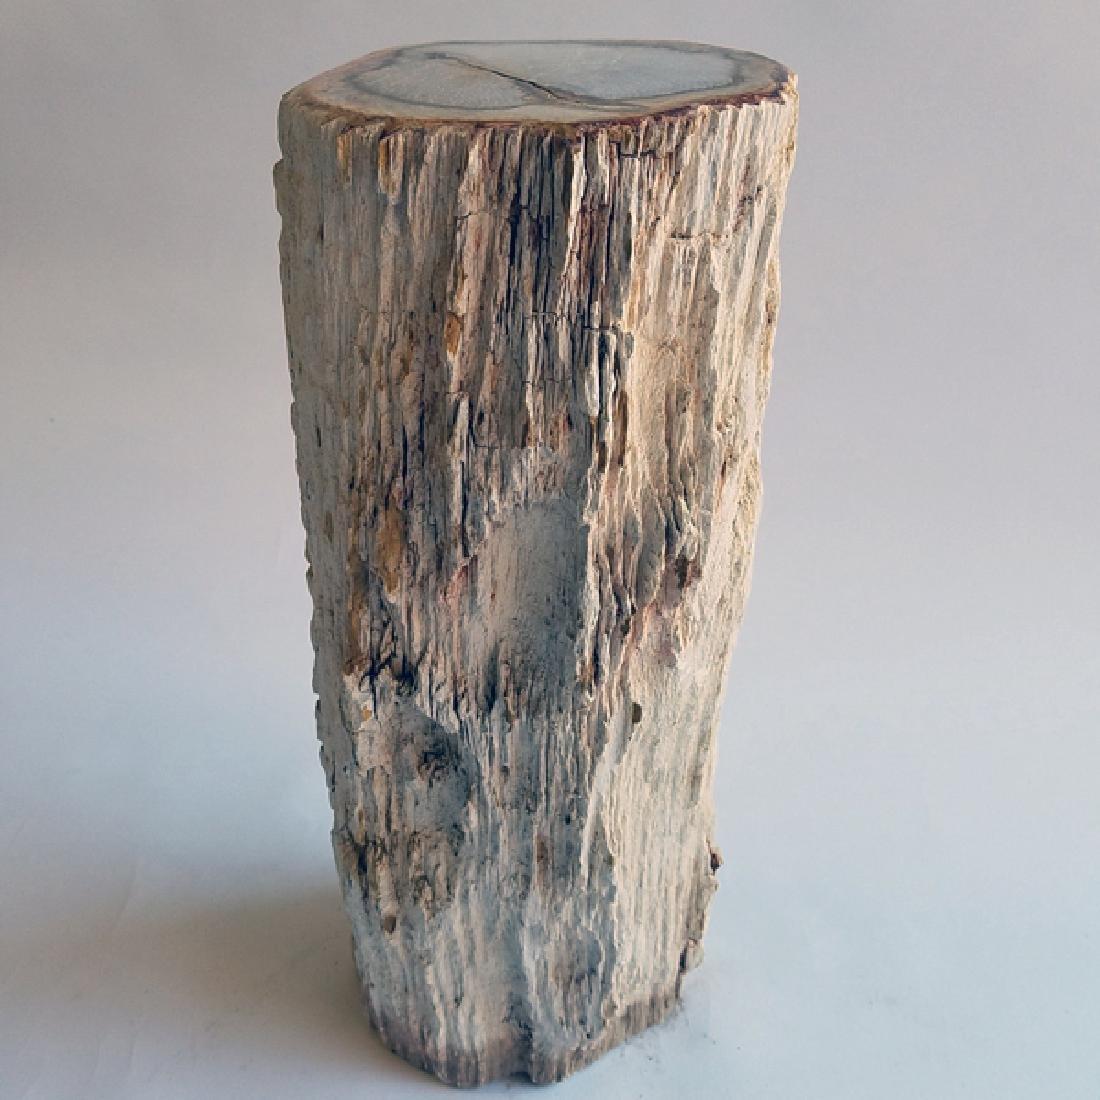 Petrified Wood Stump SCARCE HUGE 110Kg Natural Bark